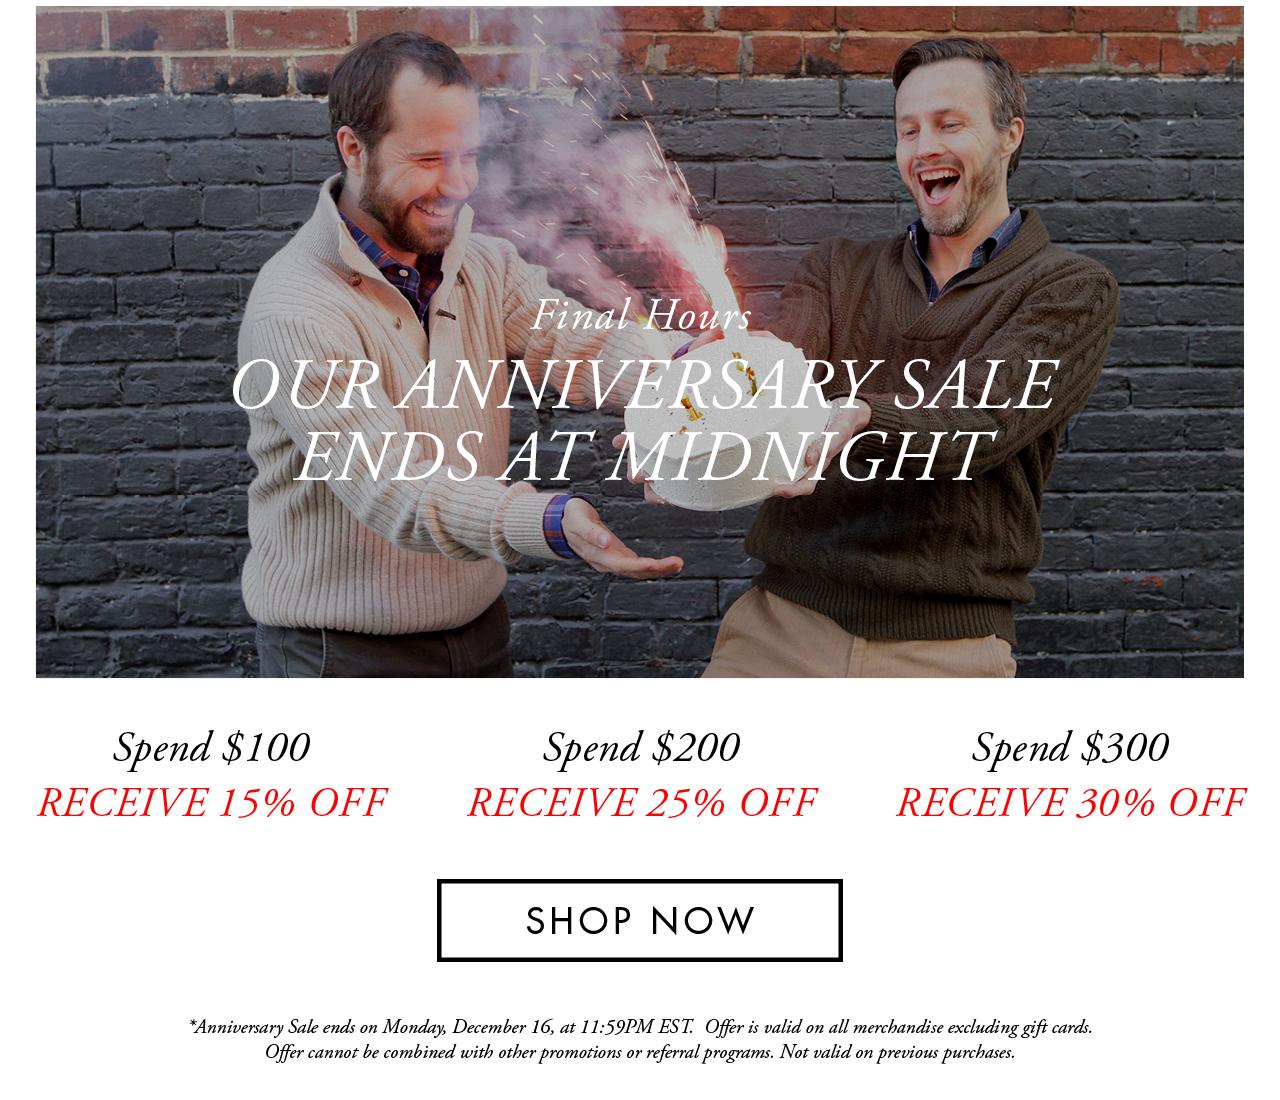 Anniversary Sale — Final Hours